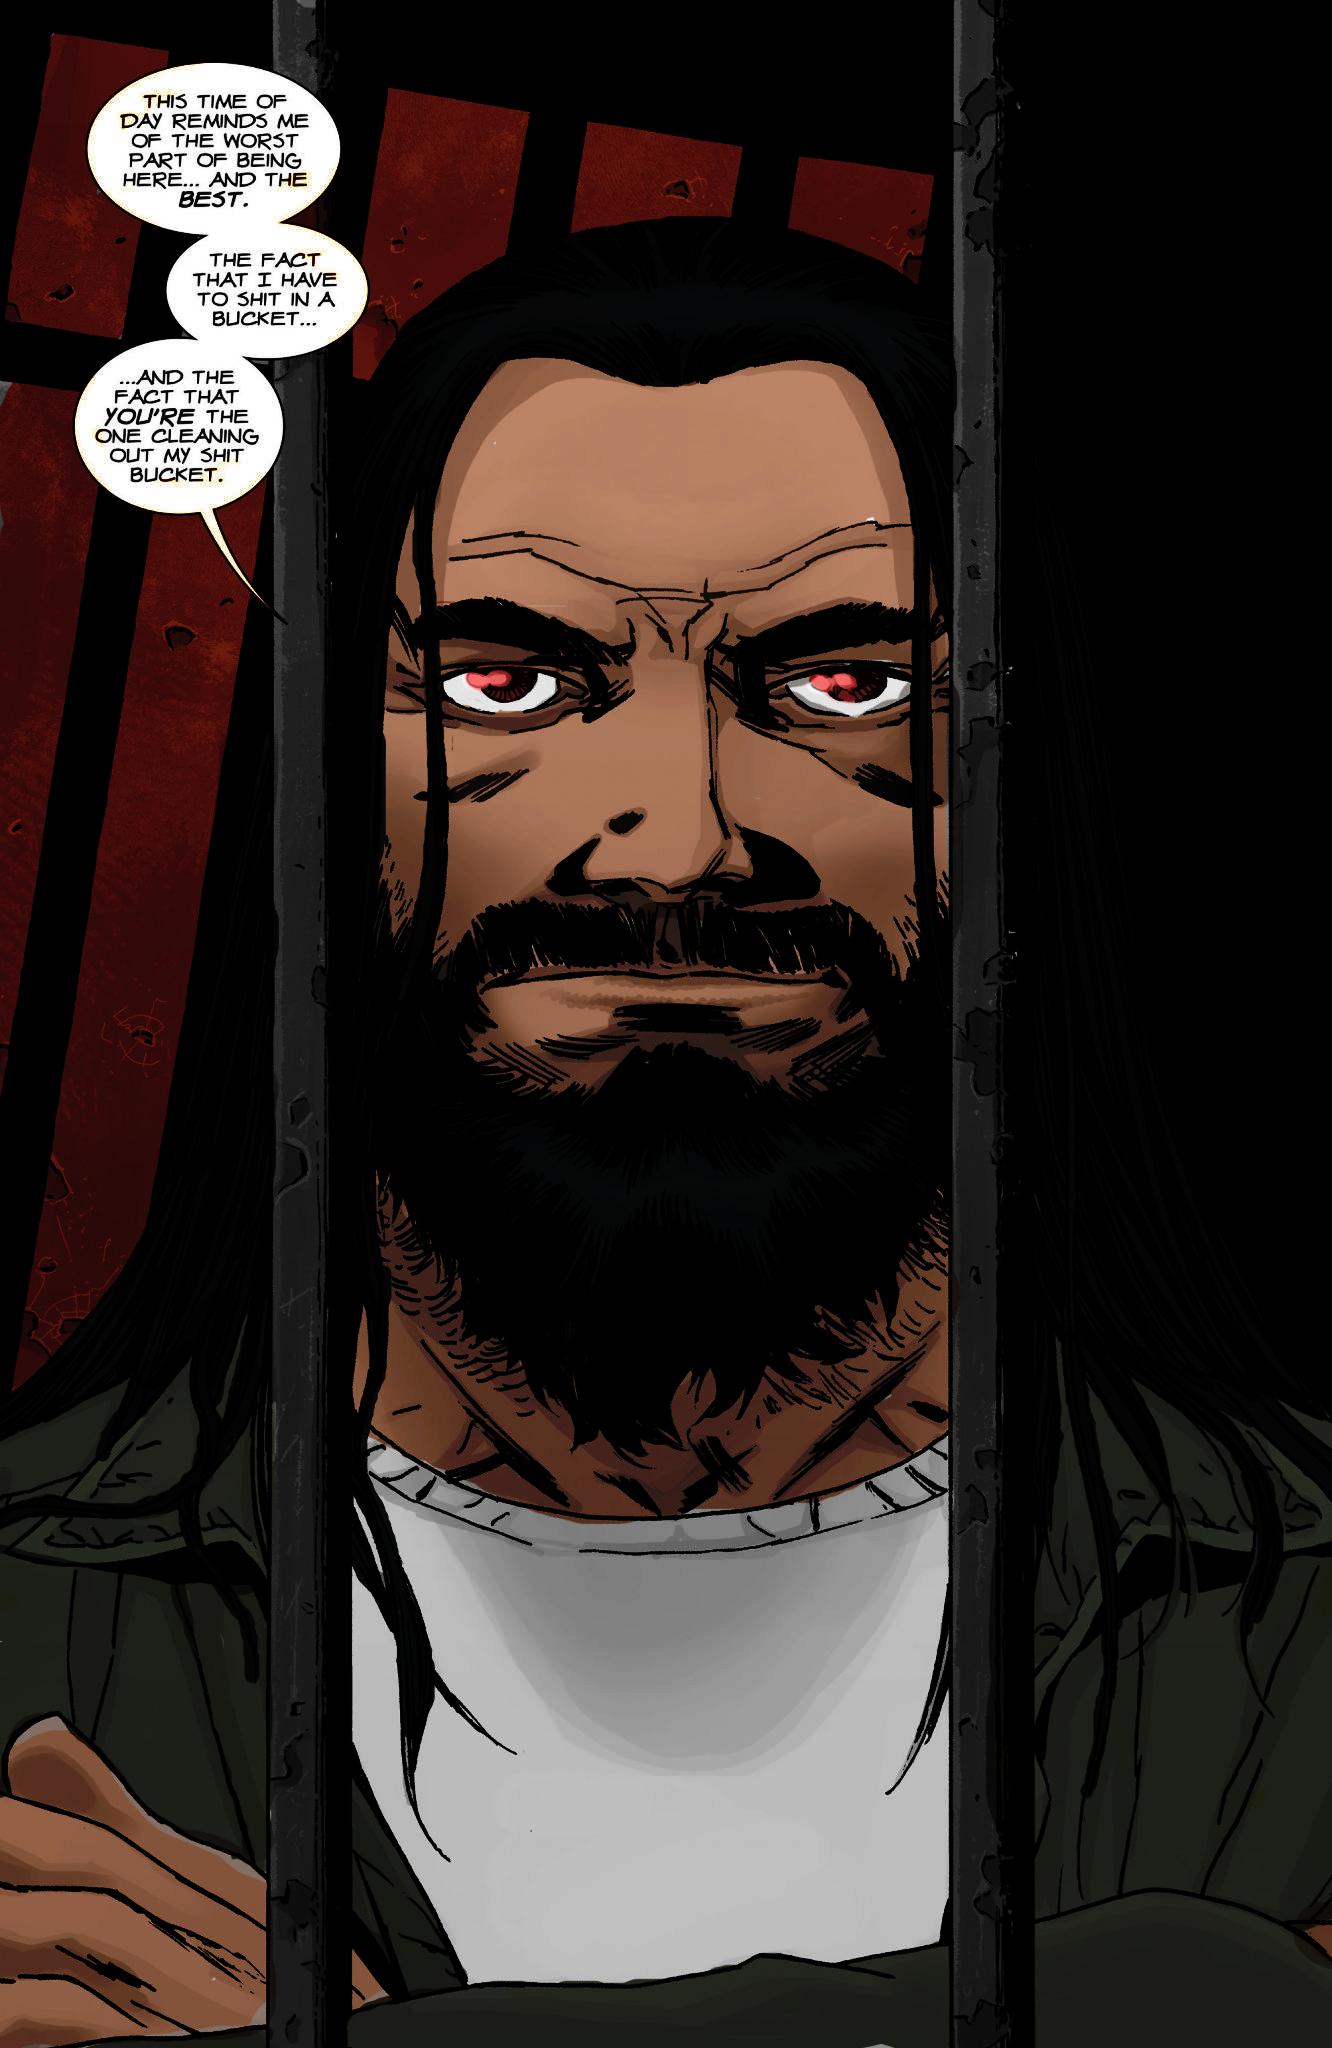 Negan_in_prison.png